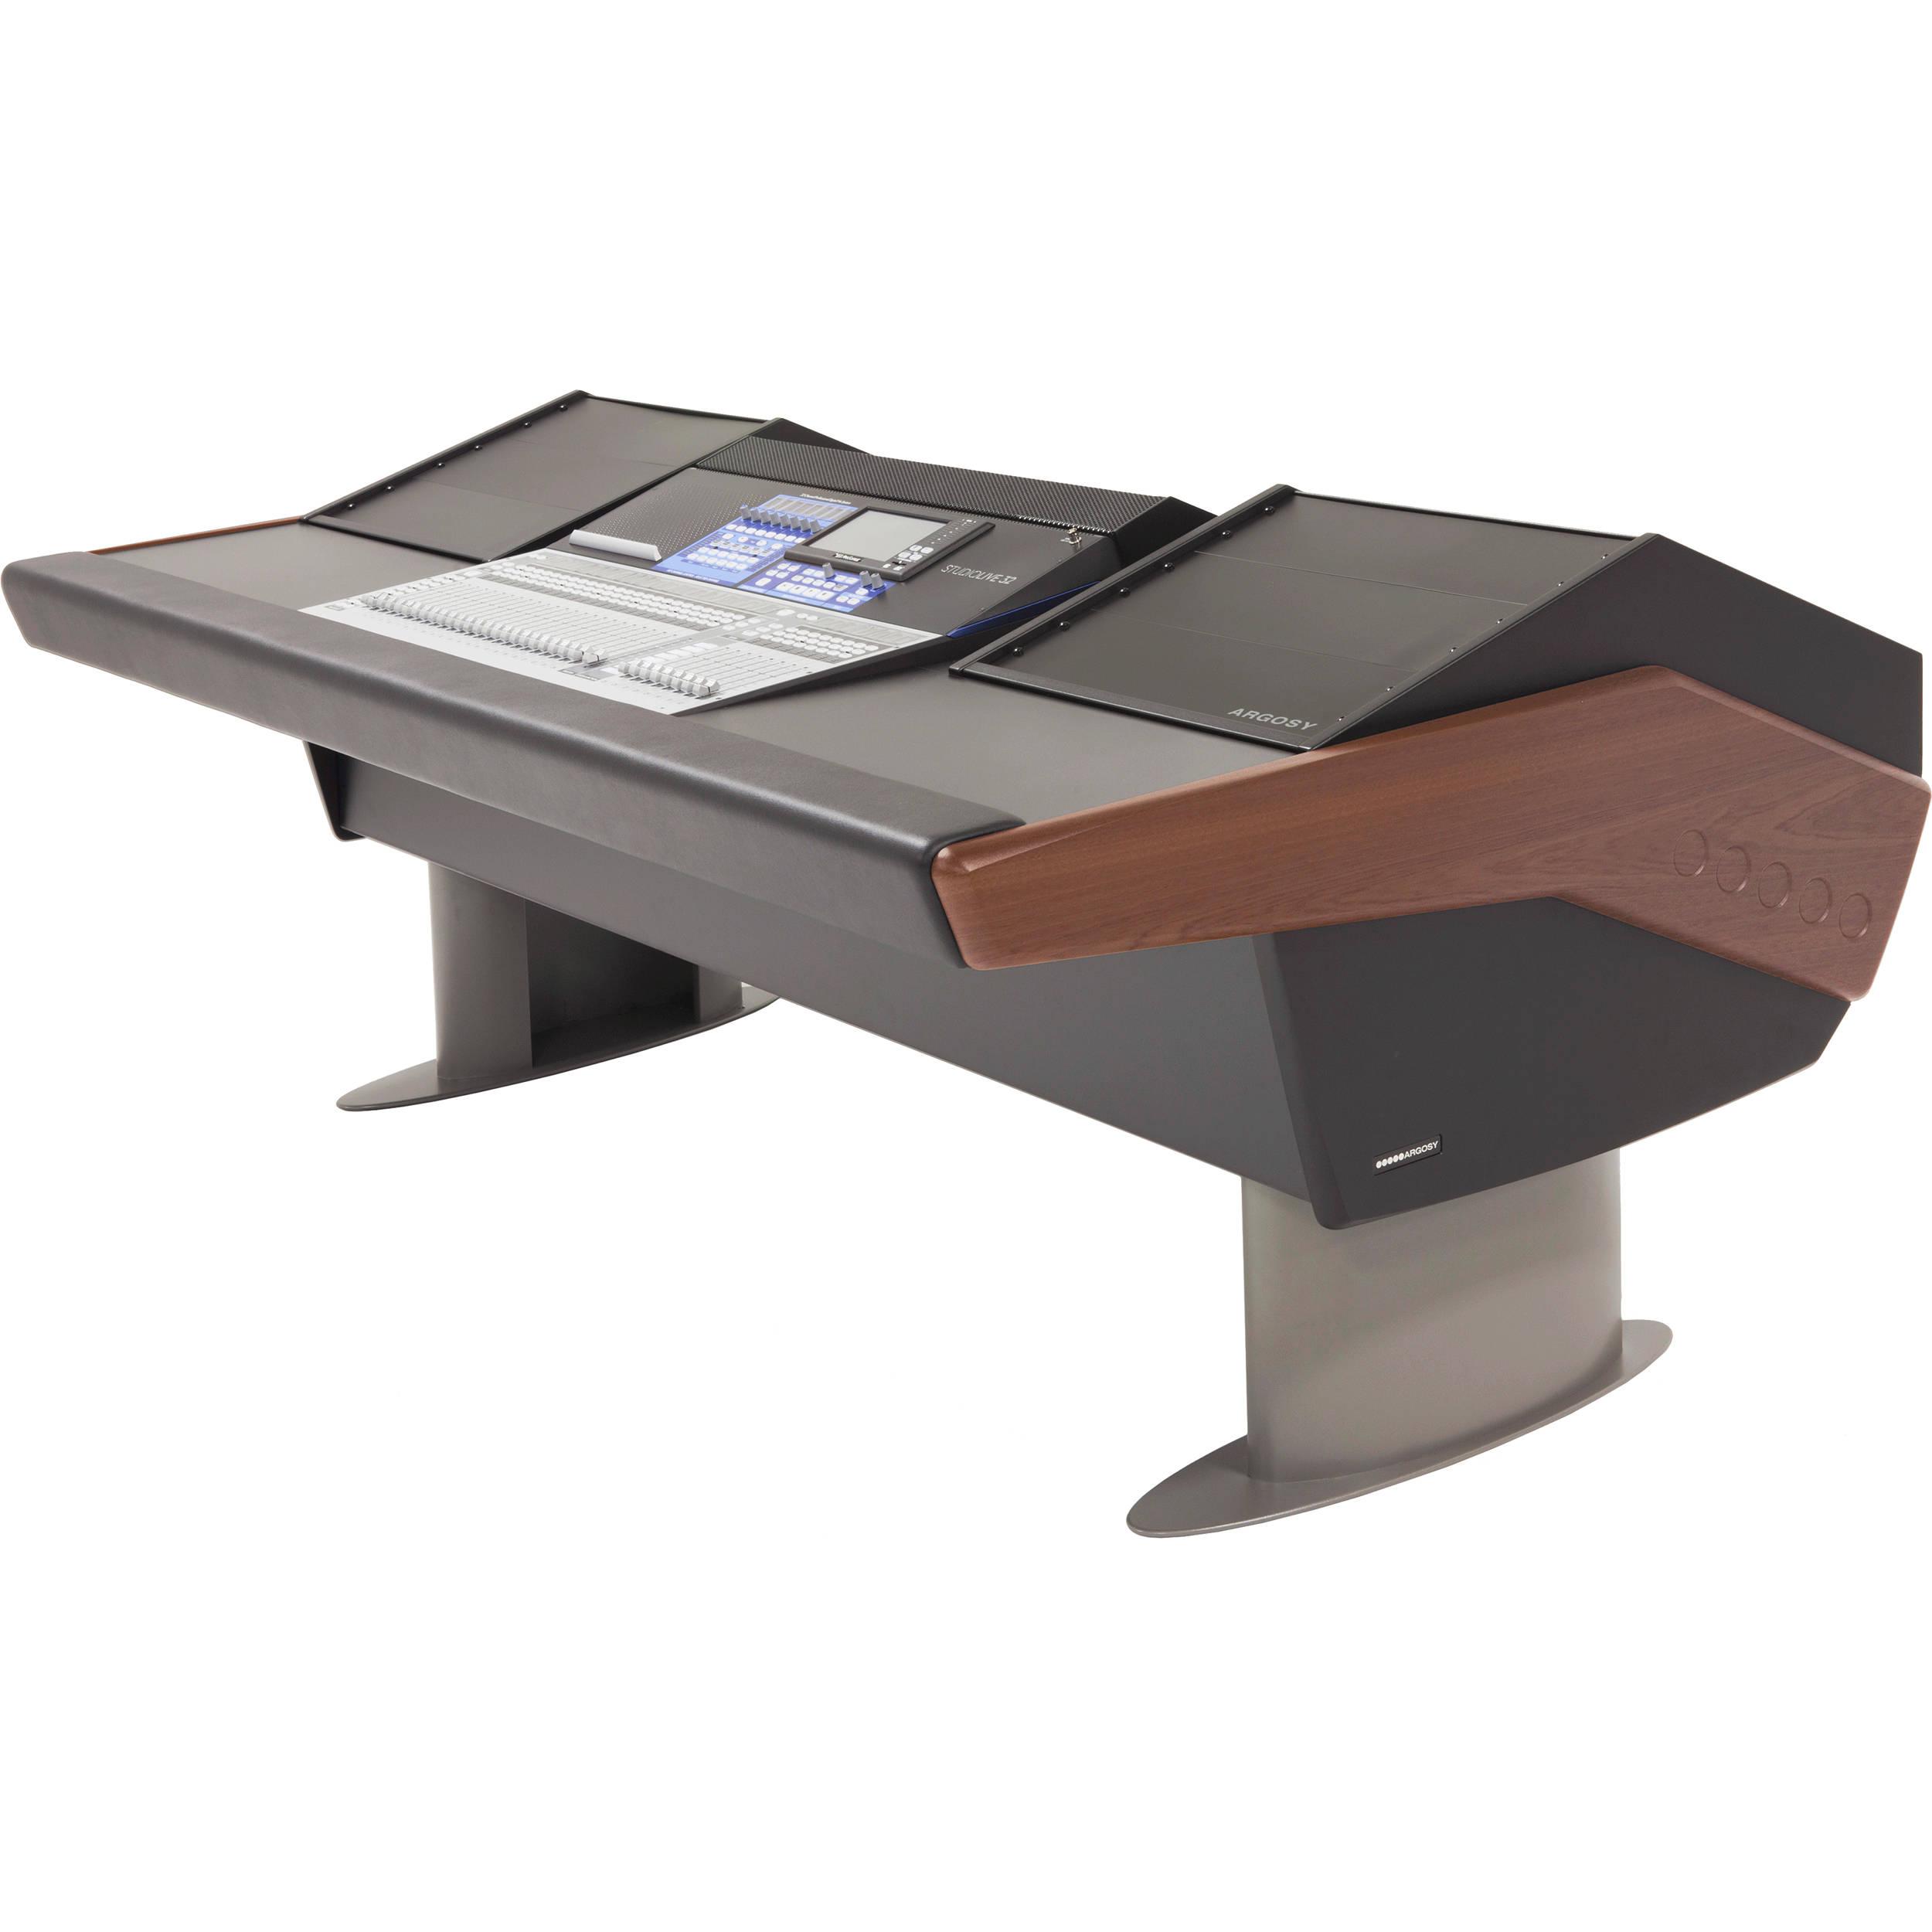 Argosy G Series Desk For Presonus G25 Psl32s3 Rr9 B M Bh 2 Way Hdmi Switch Argos Studiolive Iii 32 Channel Console Mahogany Trim